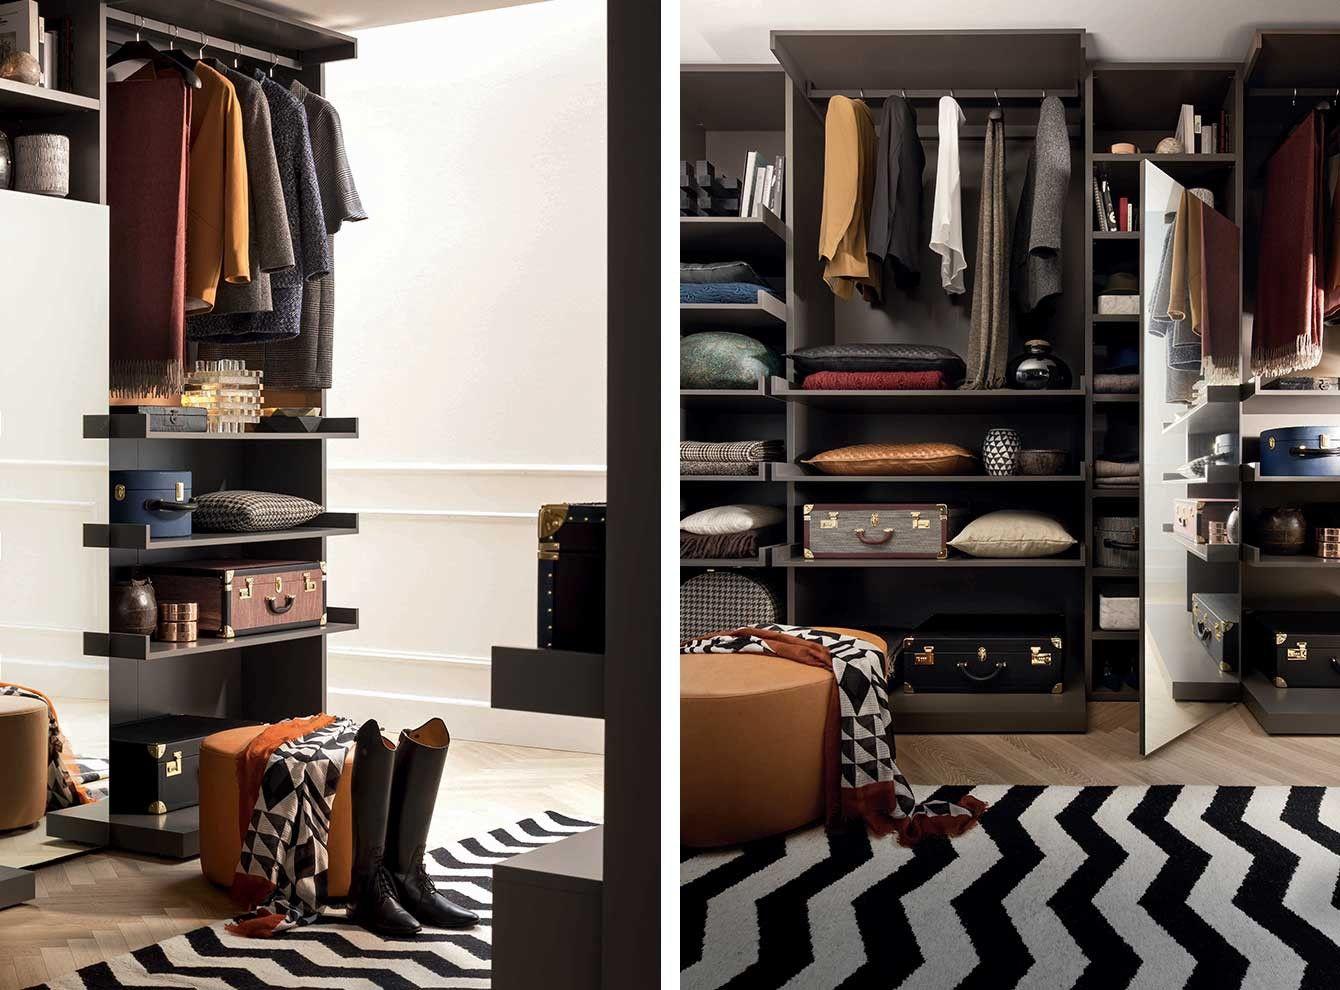 Cabina Armadio Walk In Closets : Ben walk in closets products novamobili new volumes born